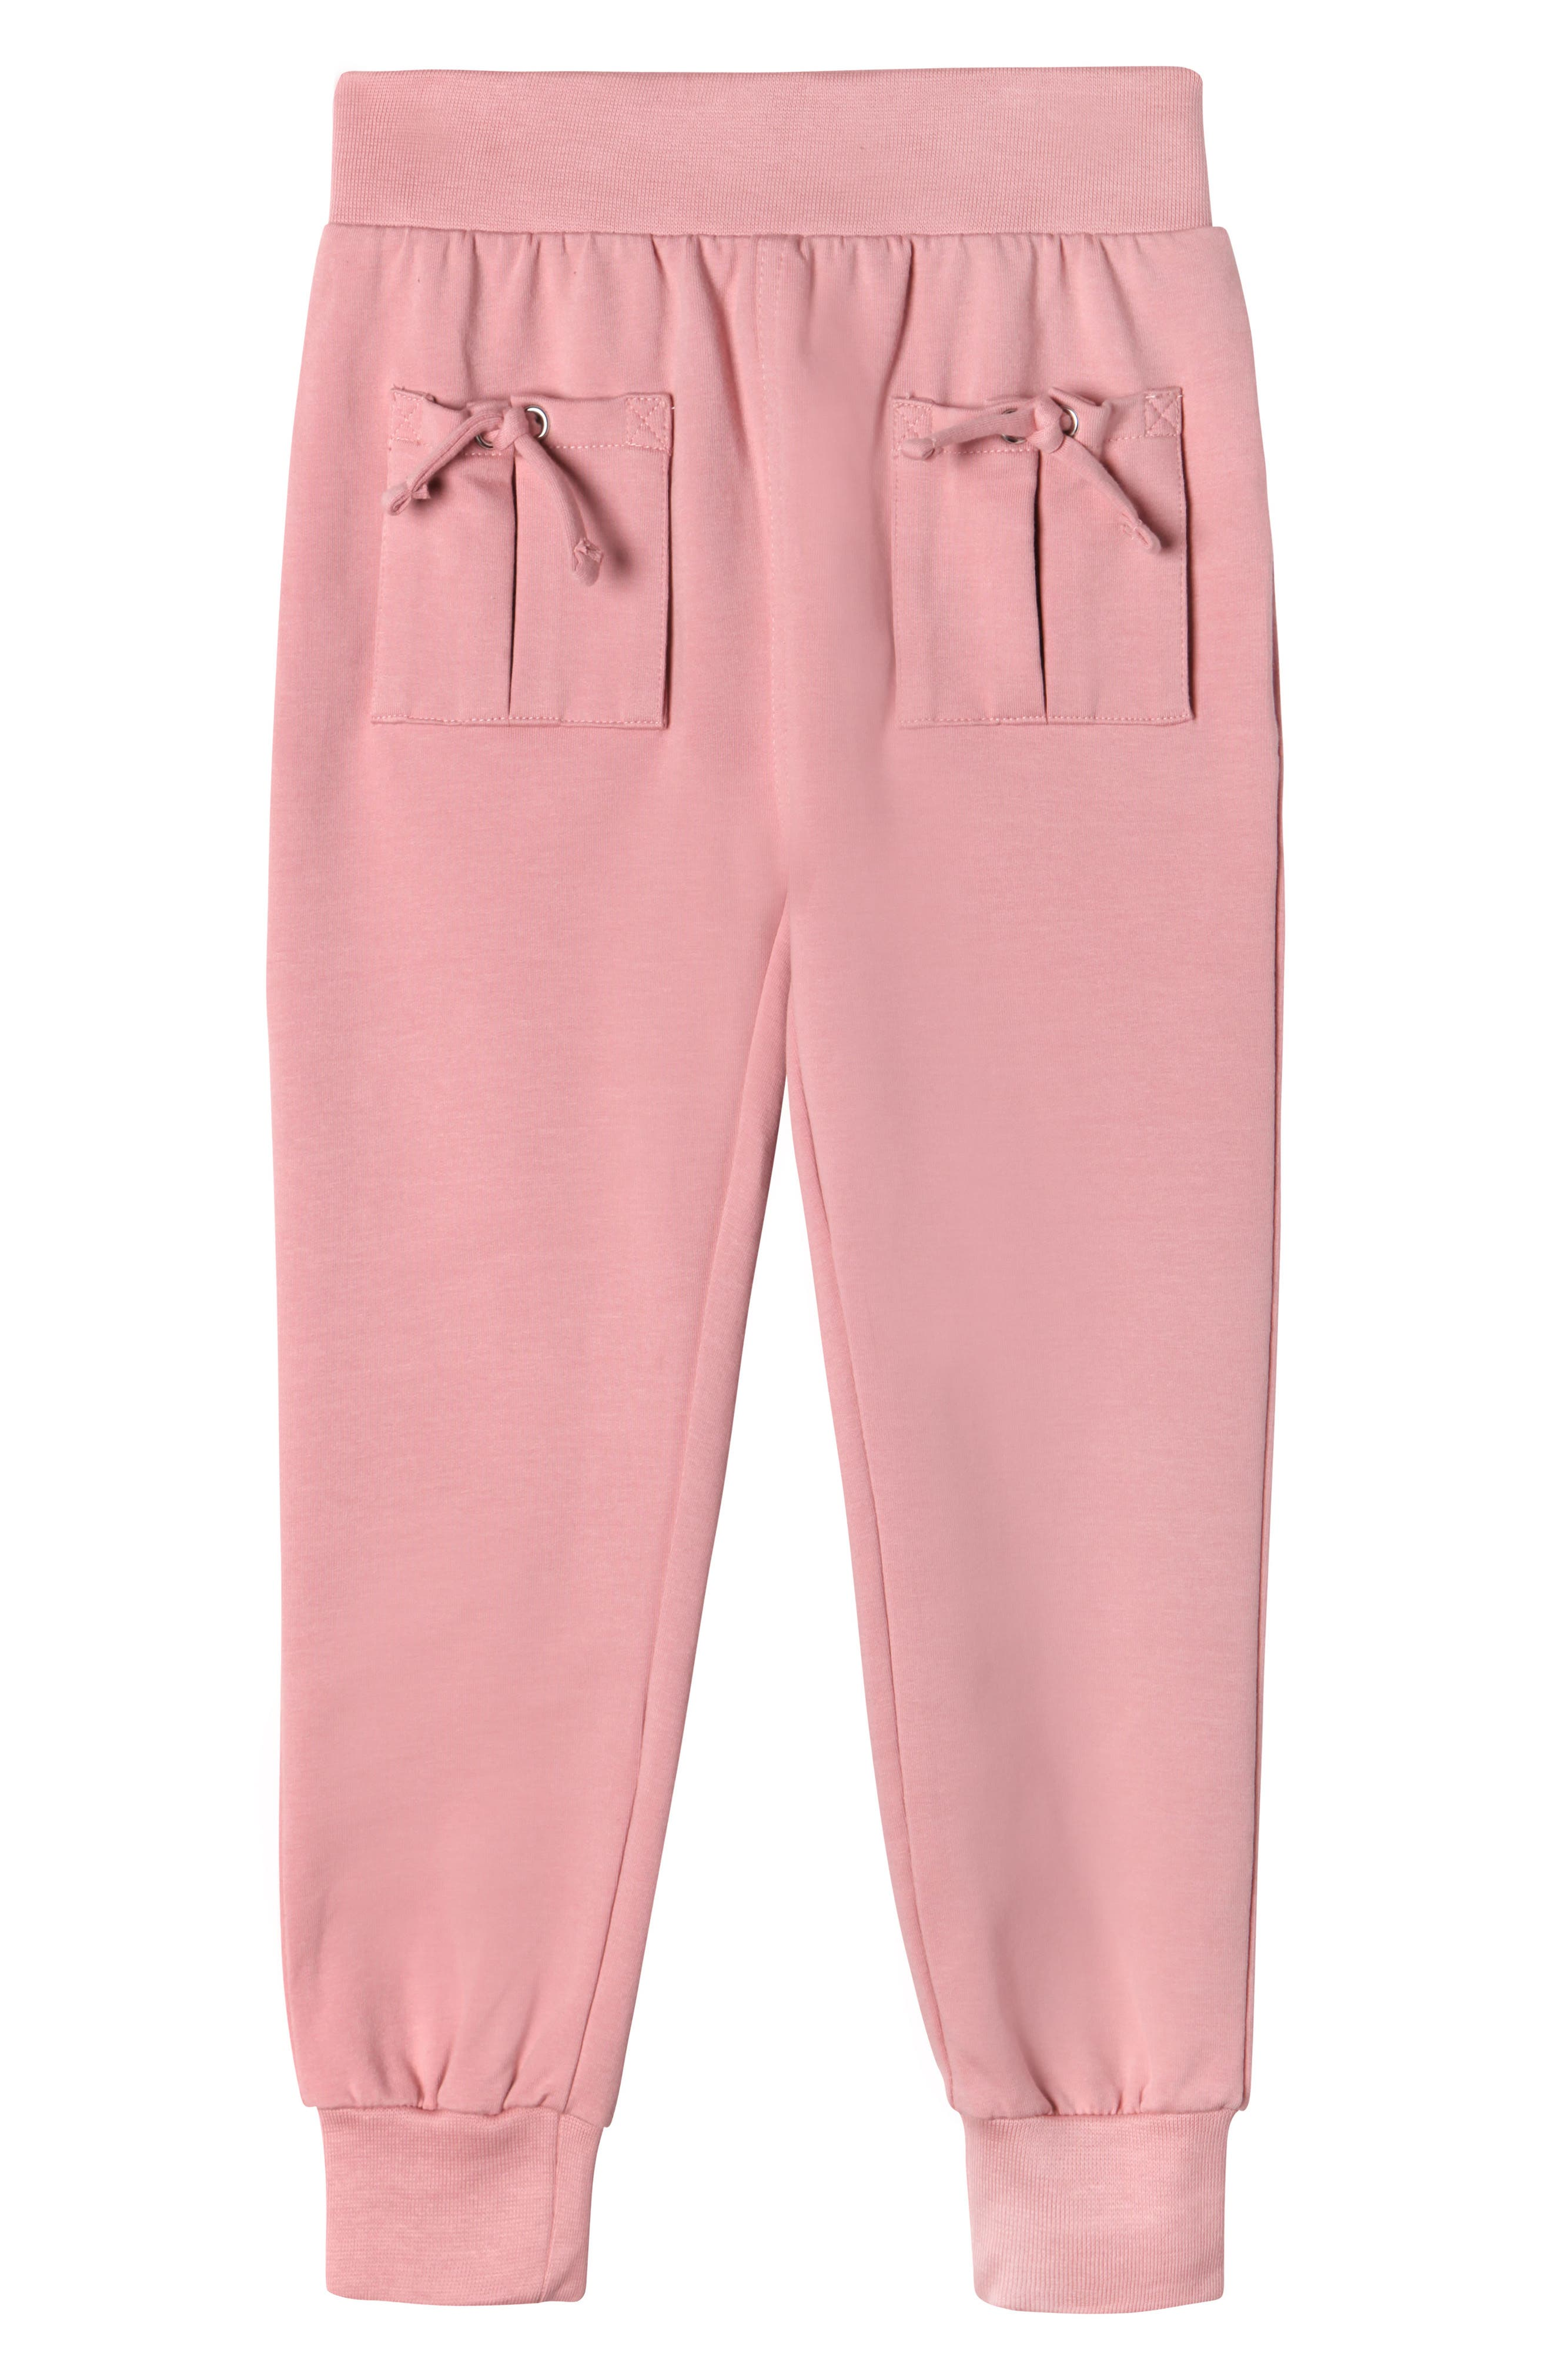 Aubrey Tie Pocket Sweatpants,                         Main,                         color, Rose